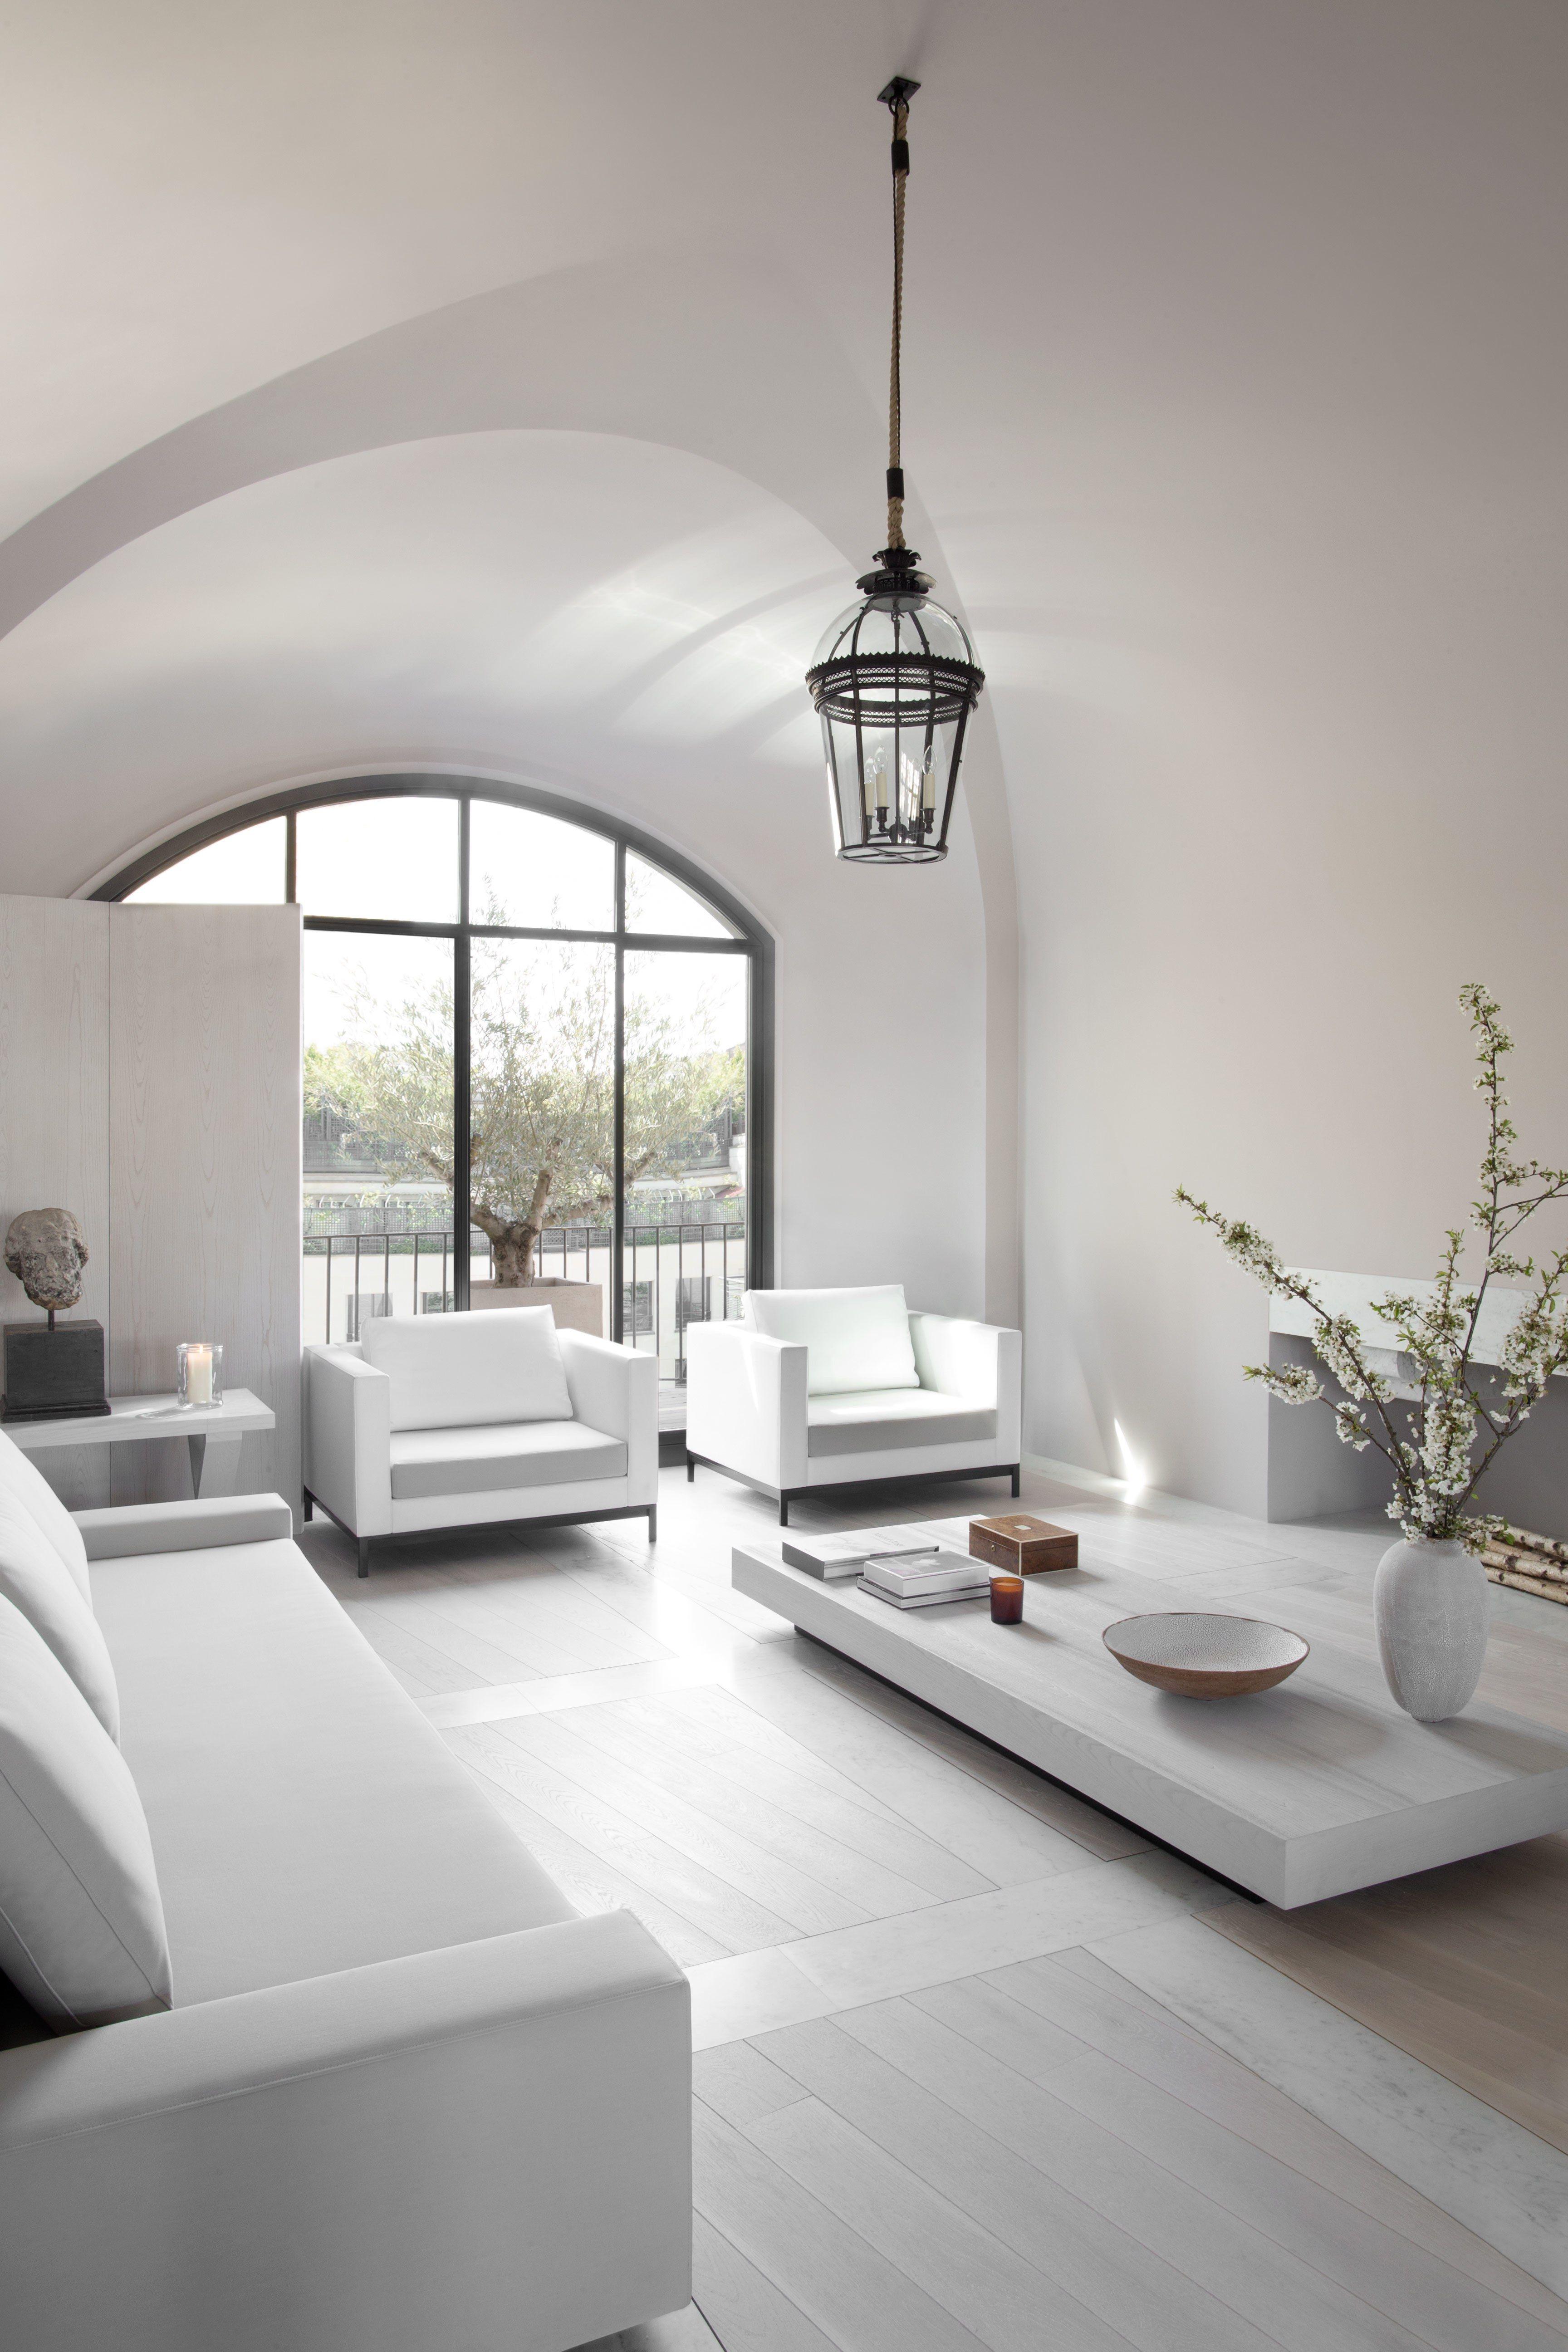 Go inside  chic paris apartment with an otherworldly aura photos architectural digest also lavish rh pinterest